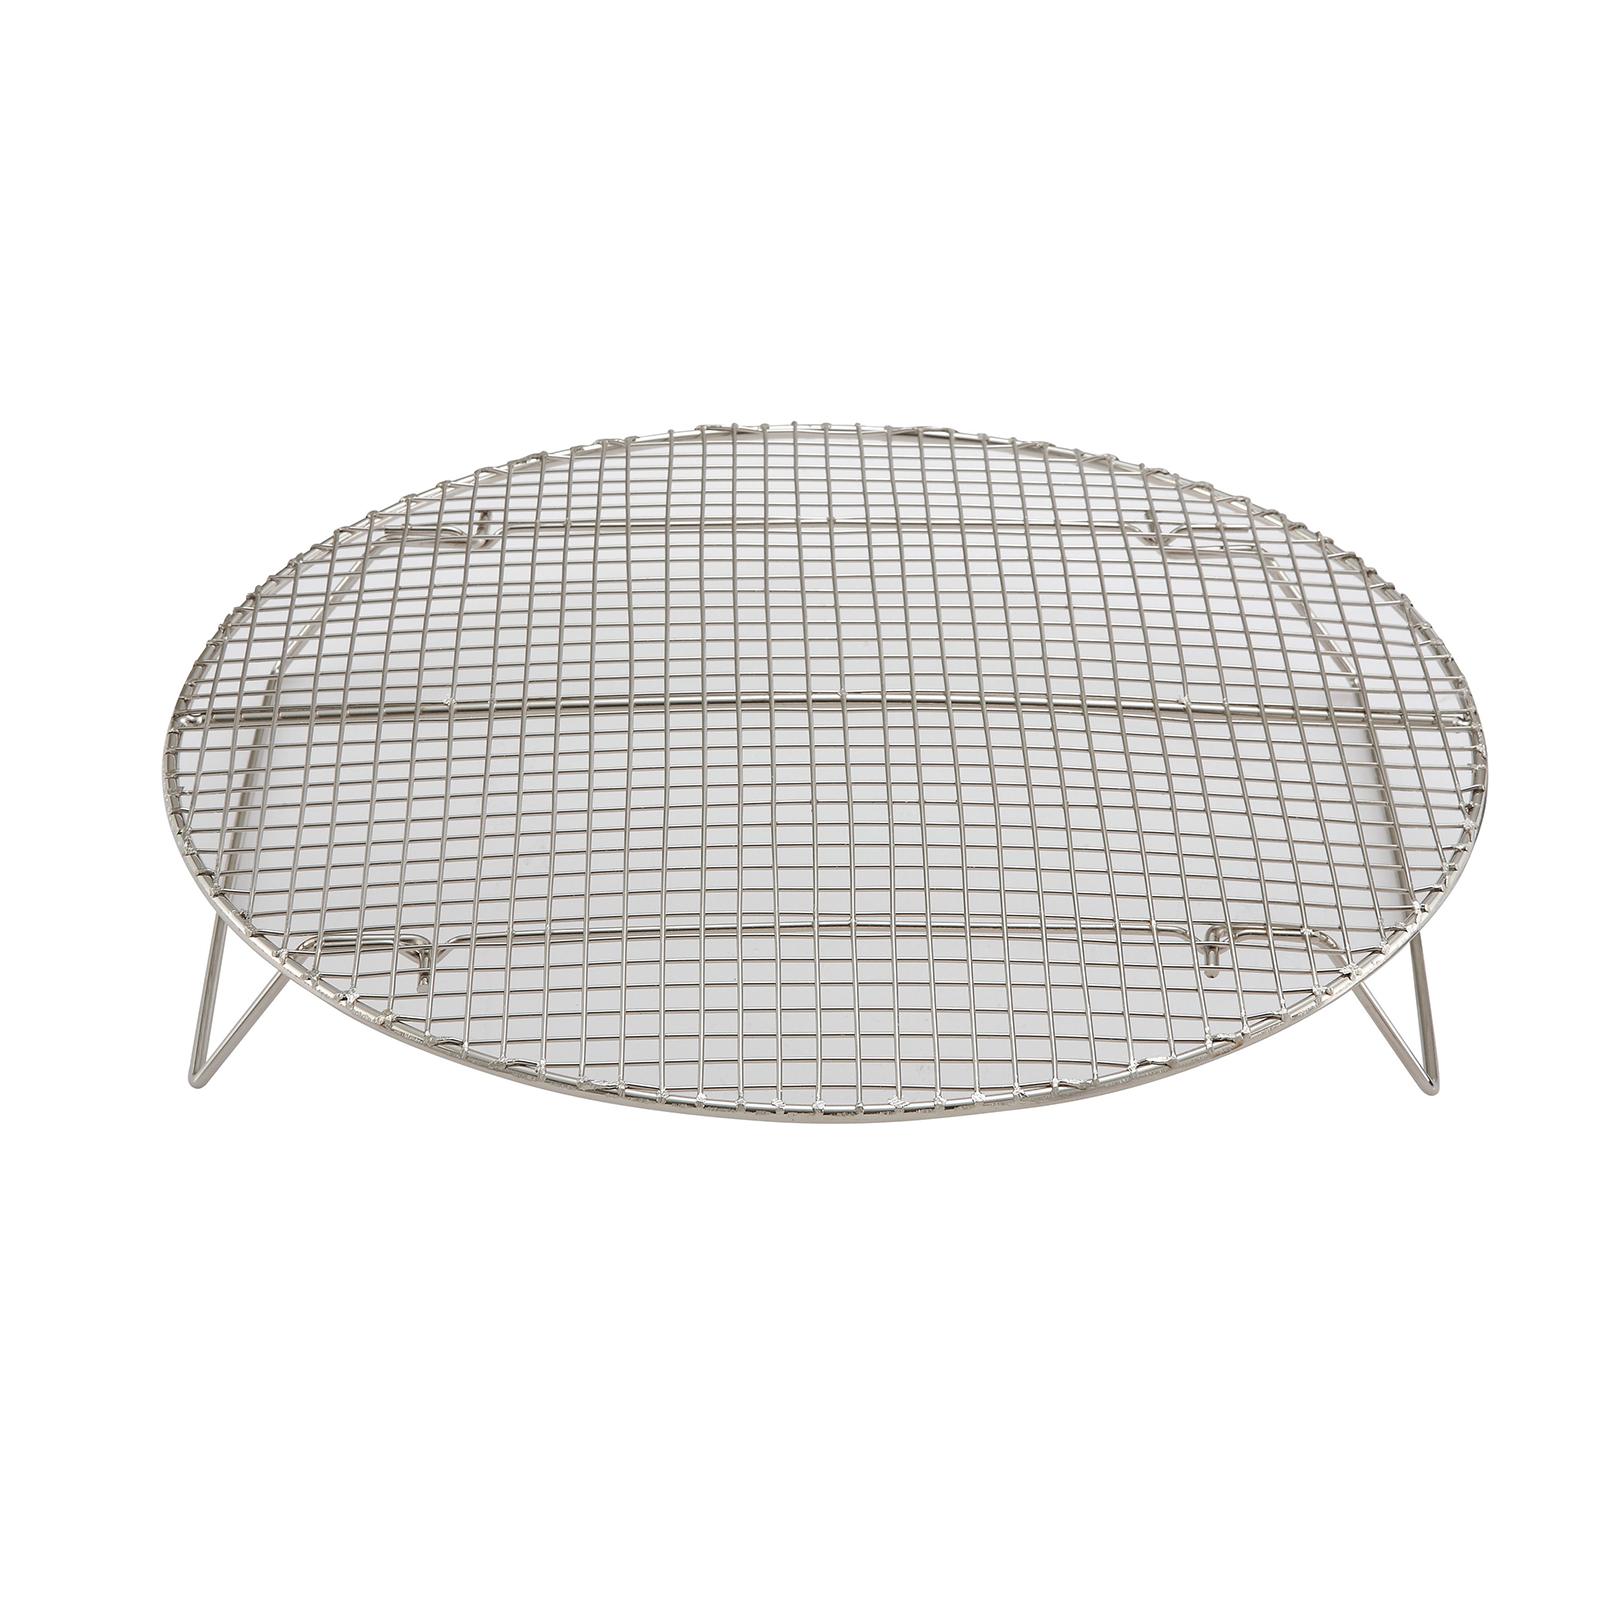 1000-33 Winco STR-13 wire pan rack / grate